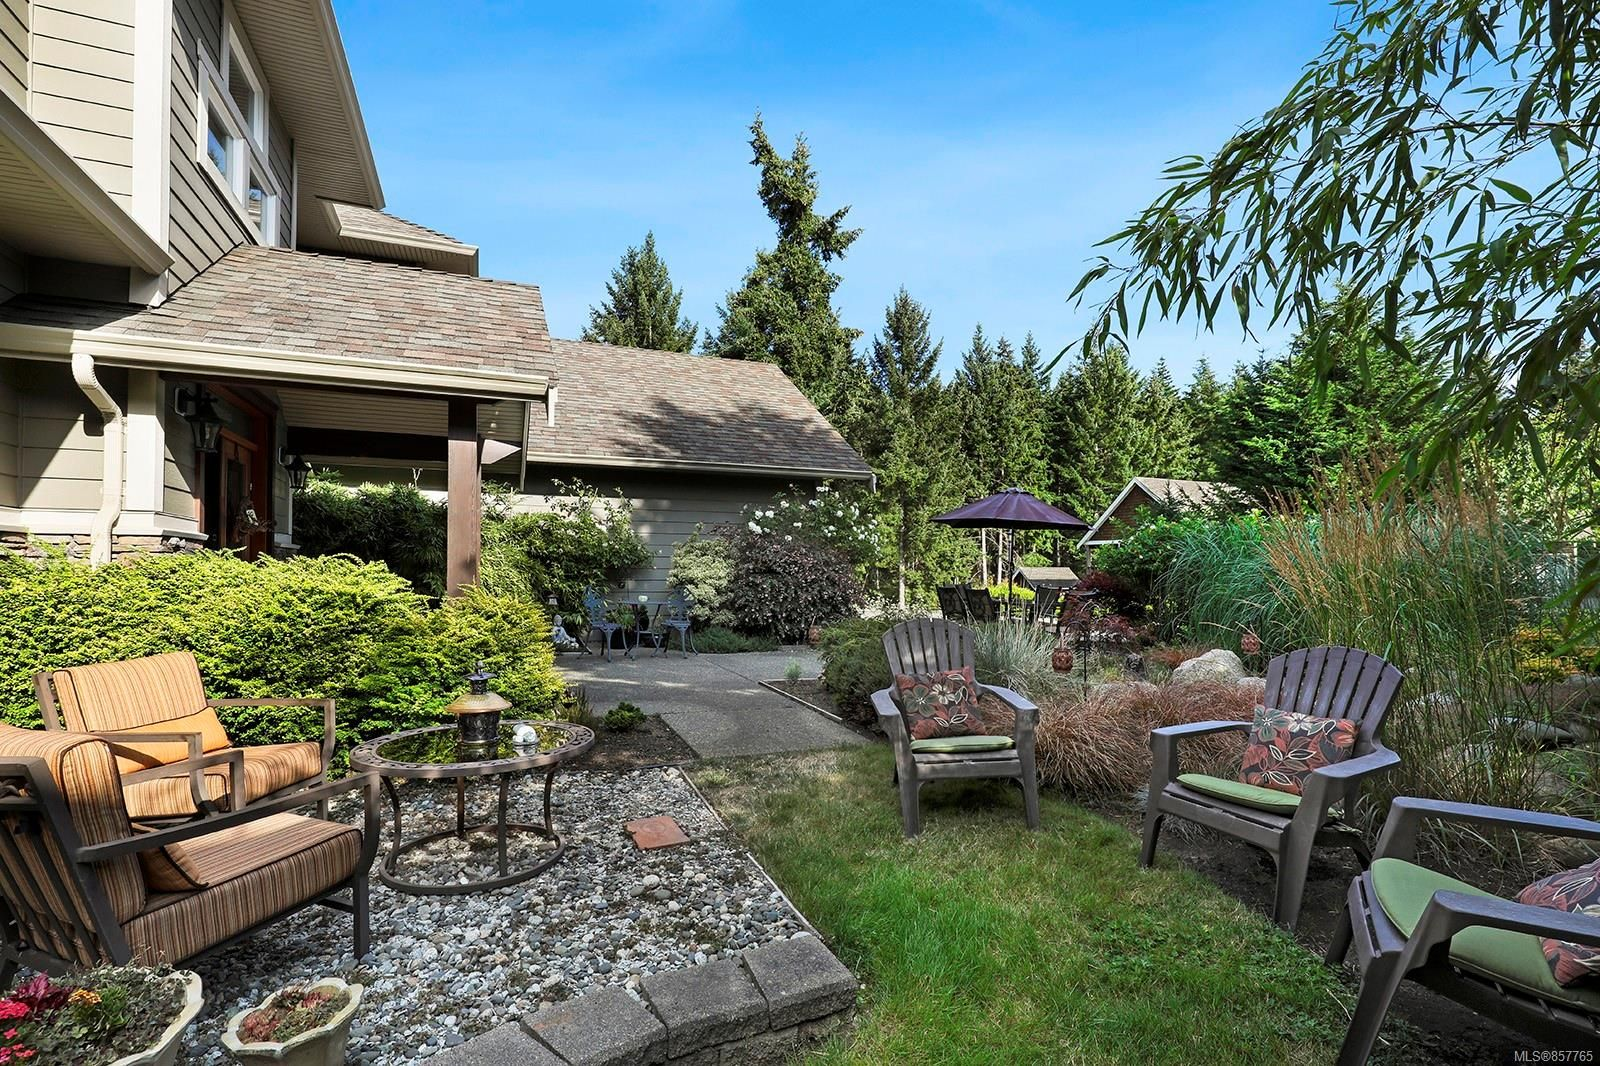 Photo 53: Photos: 1516 Highridge Dr in : CV Comox (Town of) House for sale (Comox Valley)  : MLS®# 857765